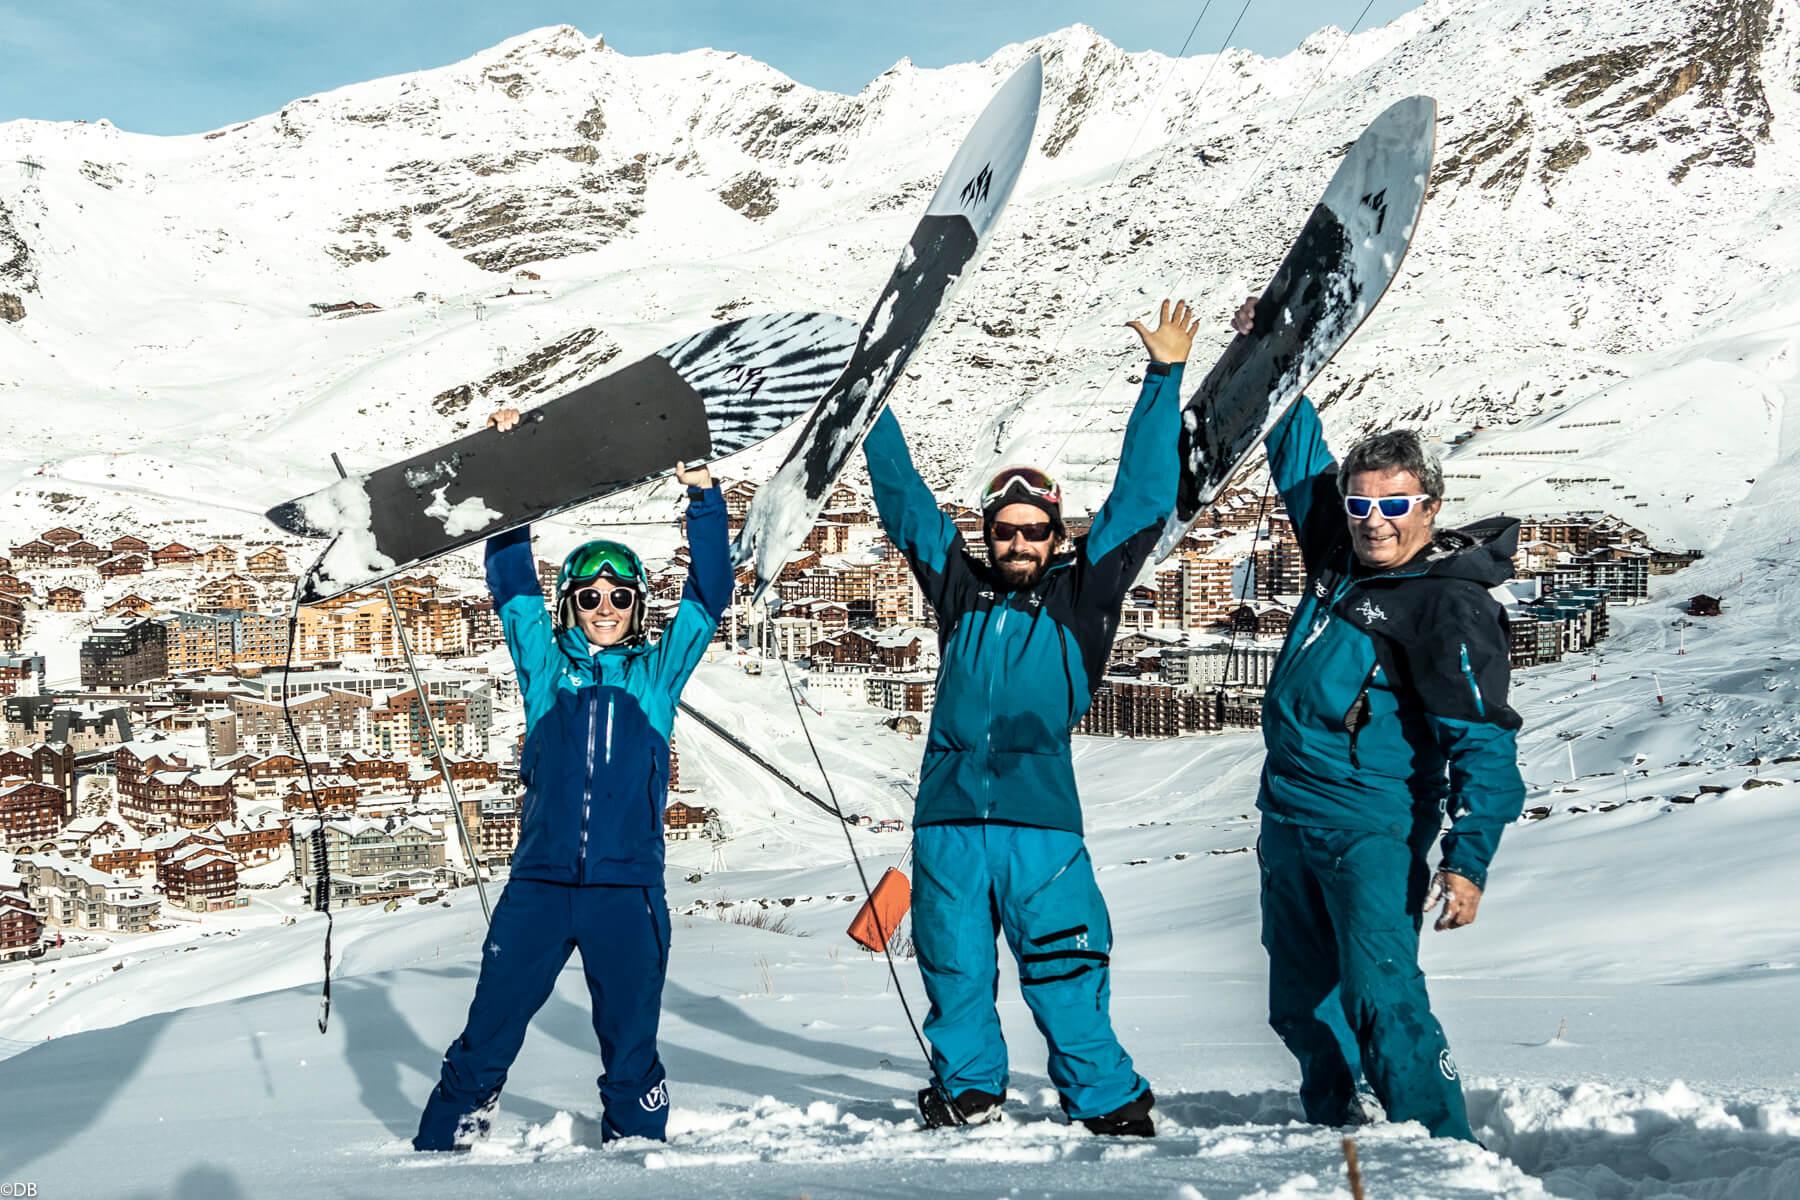 Moniteurs de ski Cool en Powsurf à Val Thorens